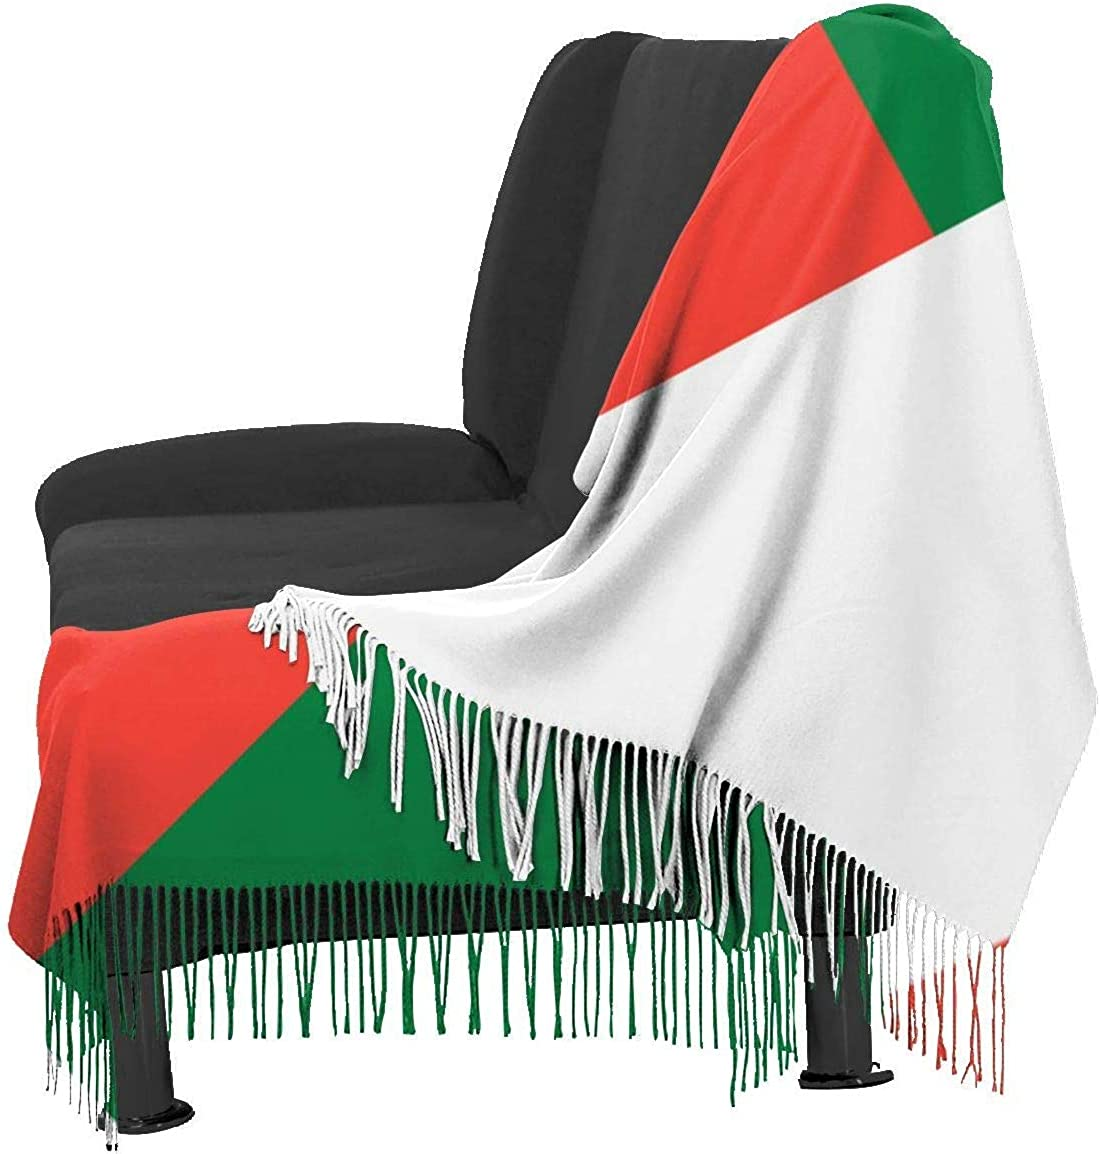 Madagascar Flag Cashmere Scarf Shawl Wraps Super Soft Warm Tassel Scarves For Women Office Worker Travel